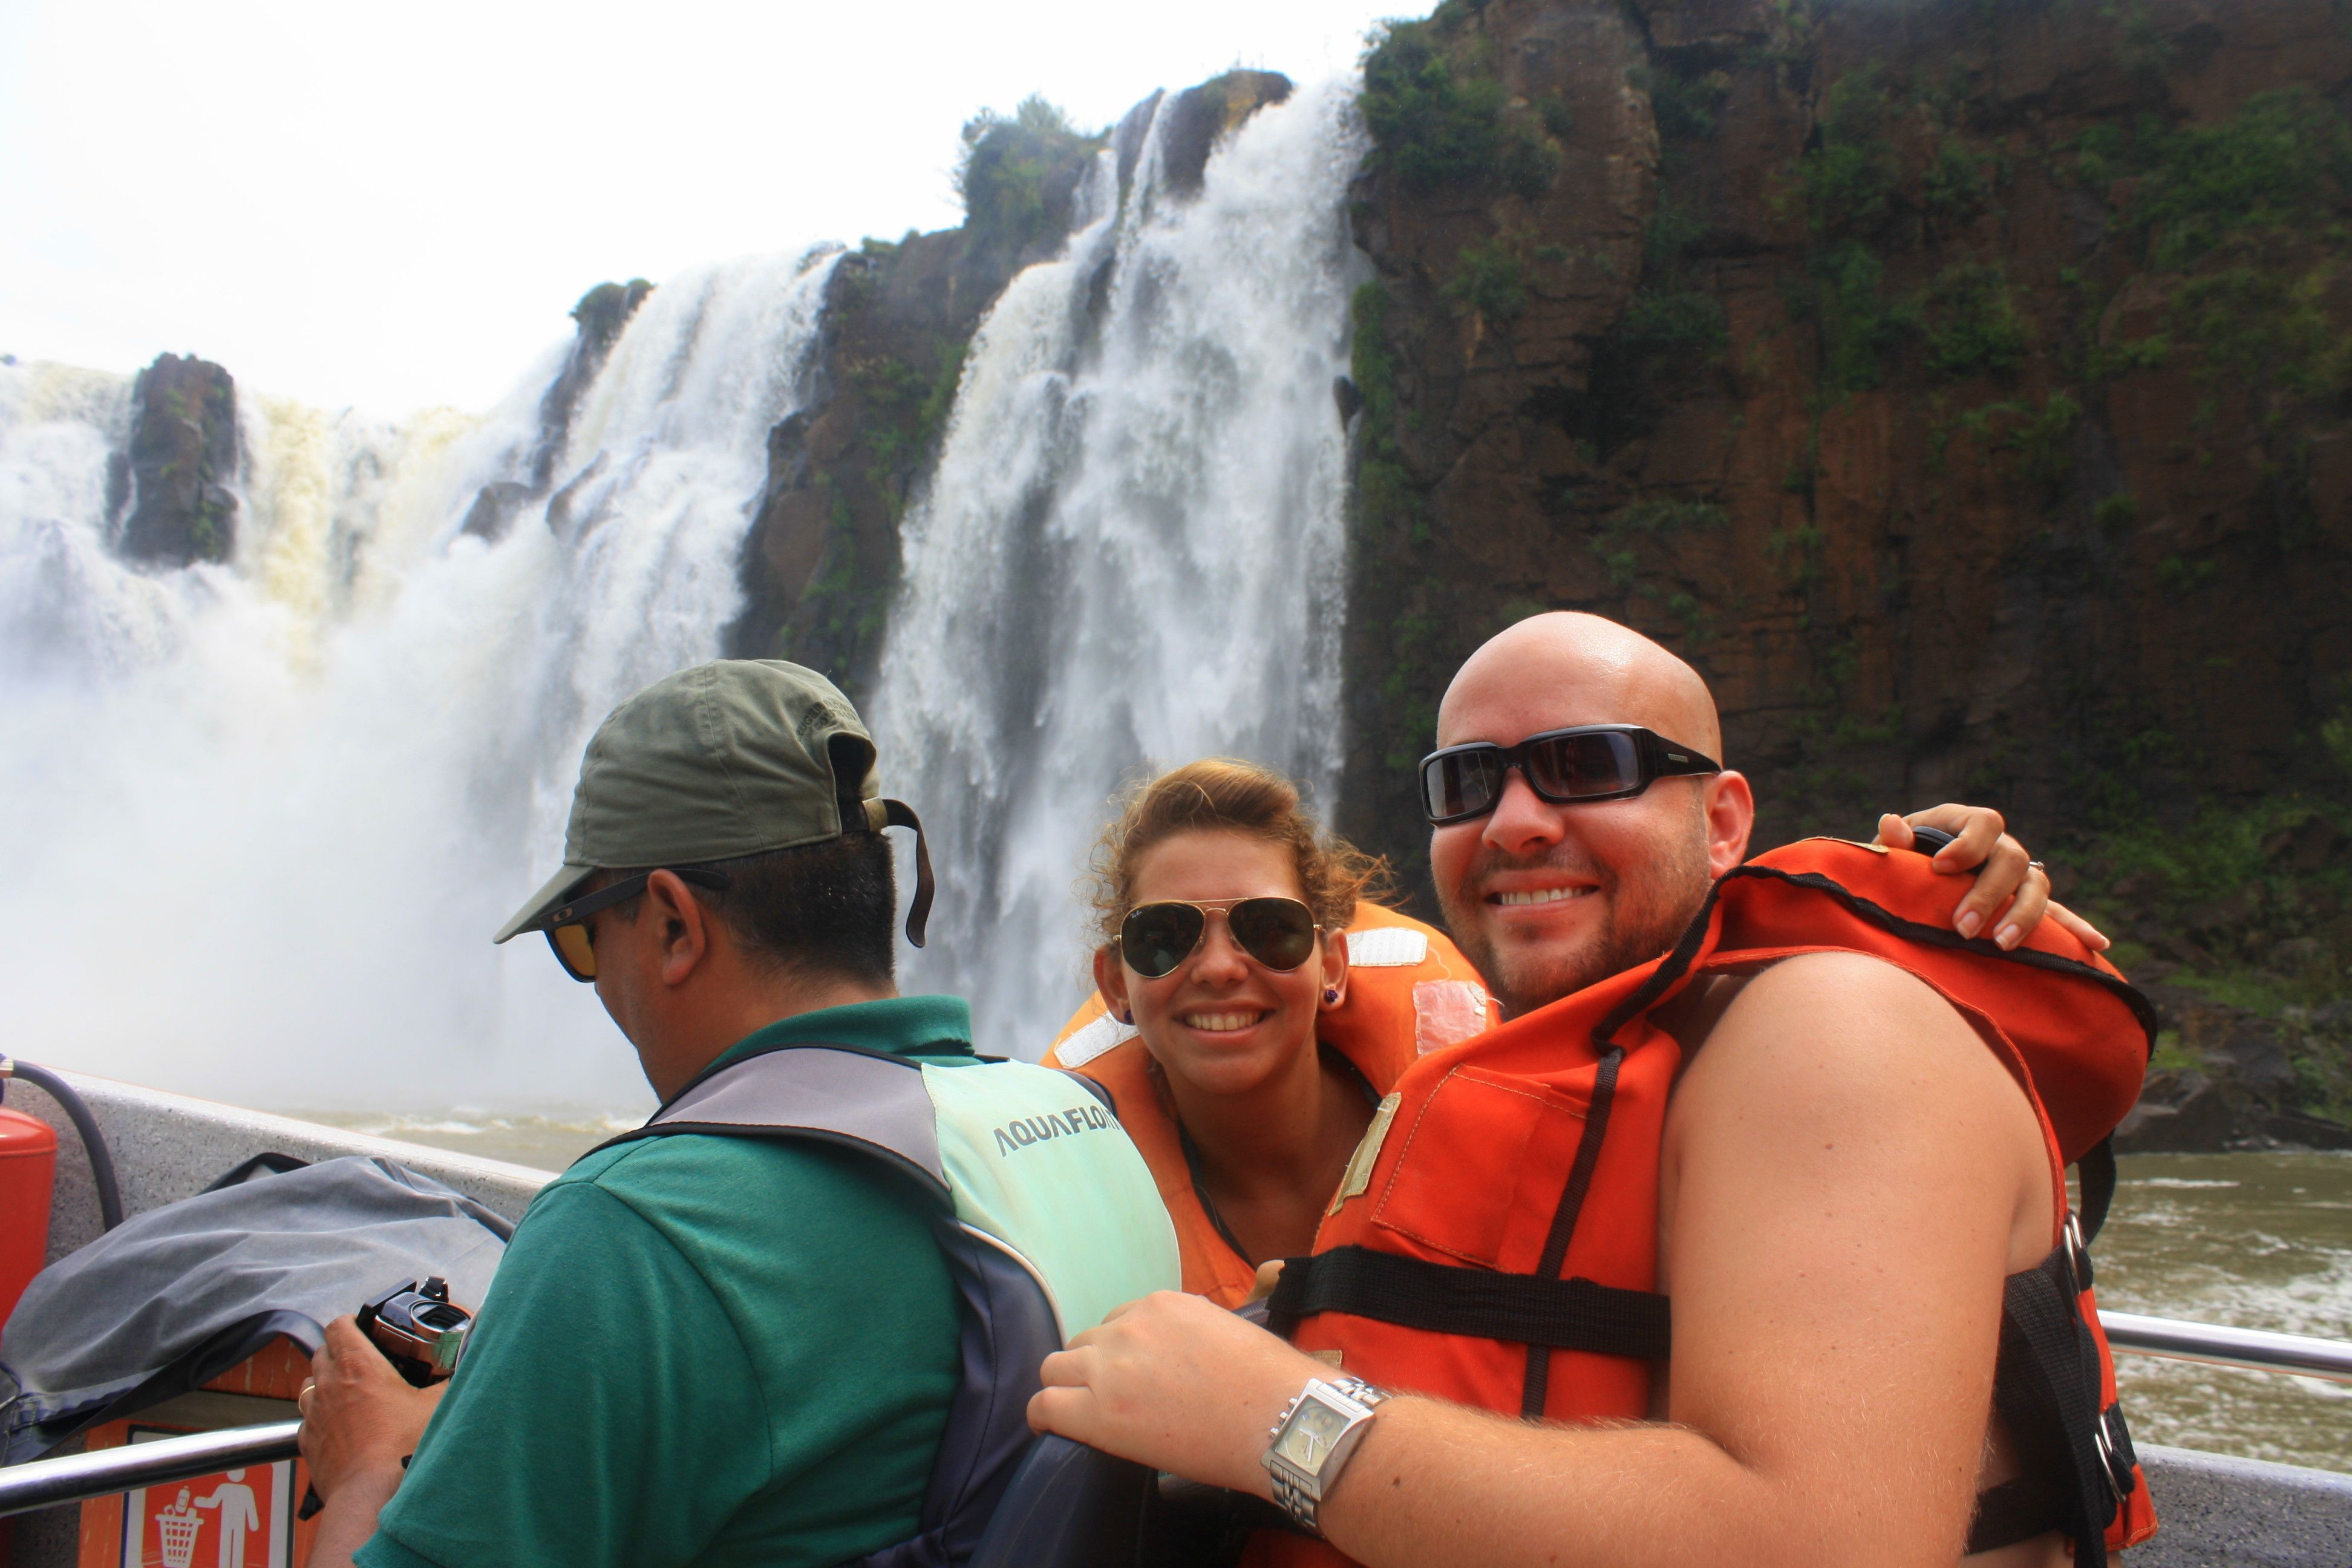 Foz do Iguaçu in Paraná